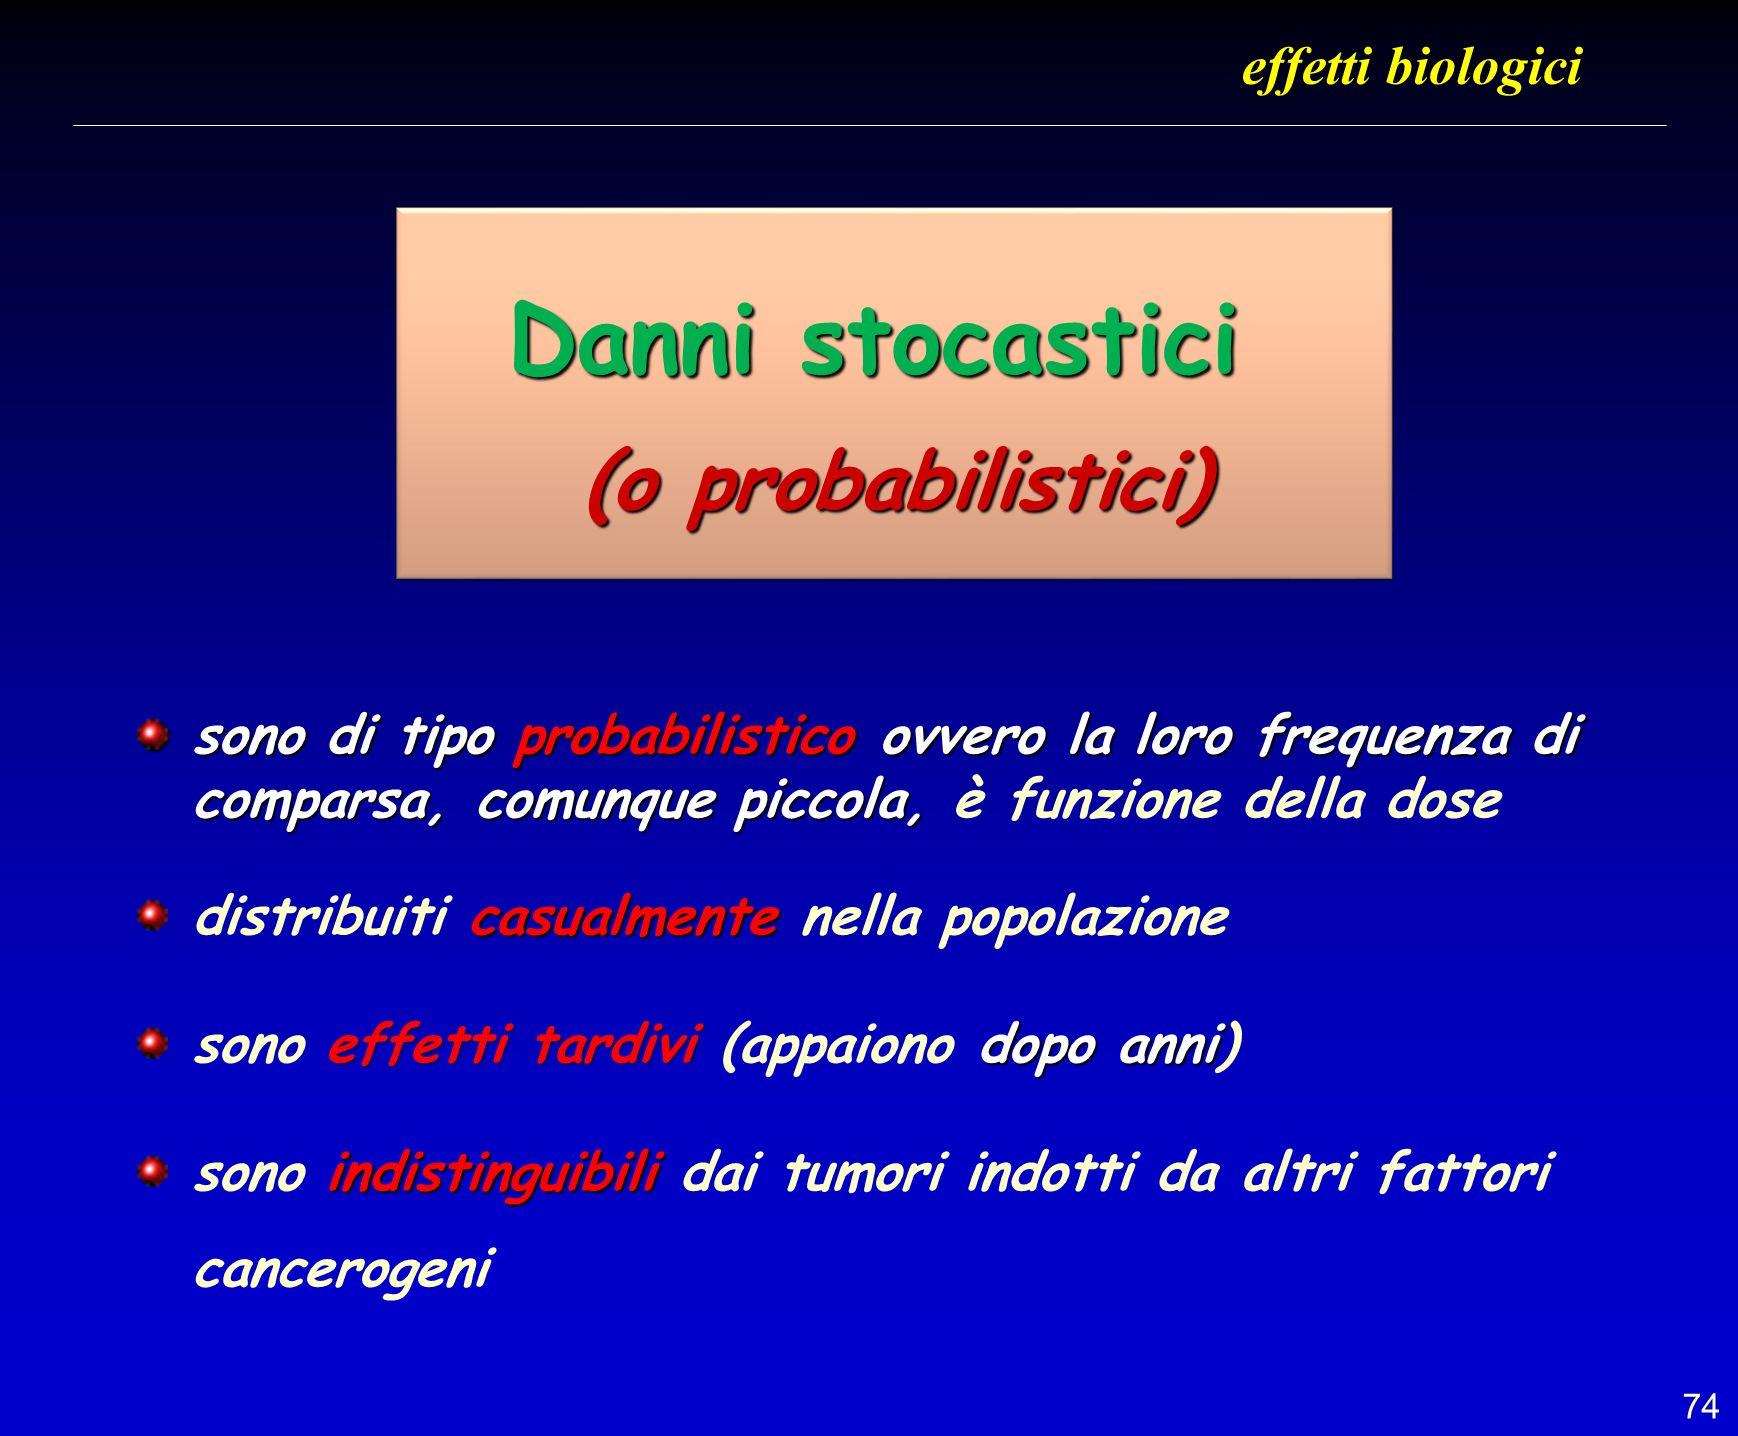 Danni stocastici (o probabilistici) effetti biologici